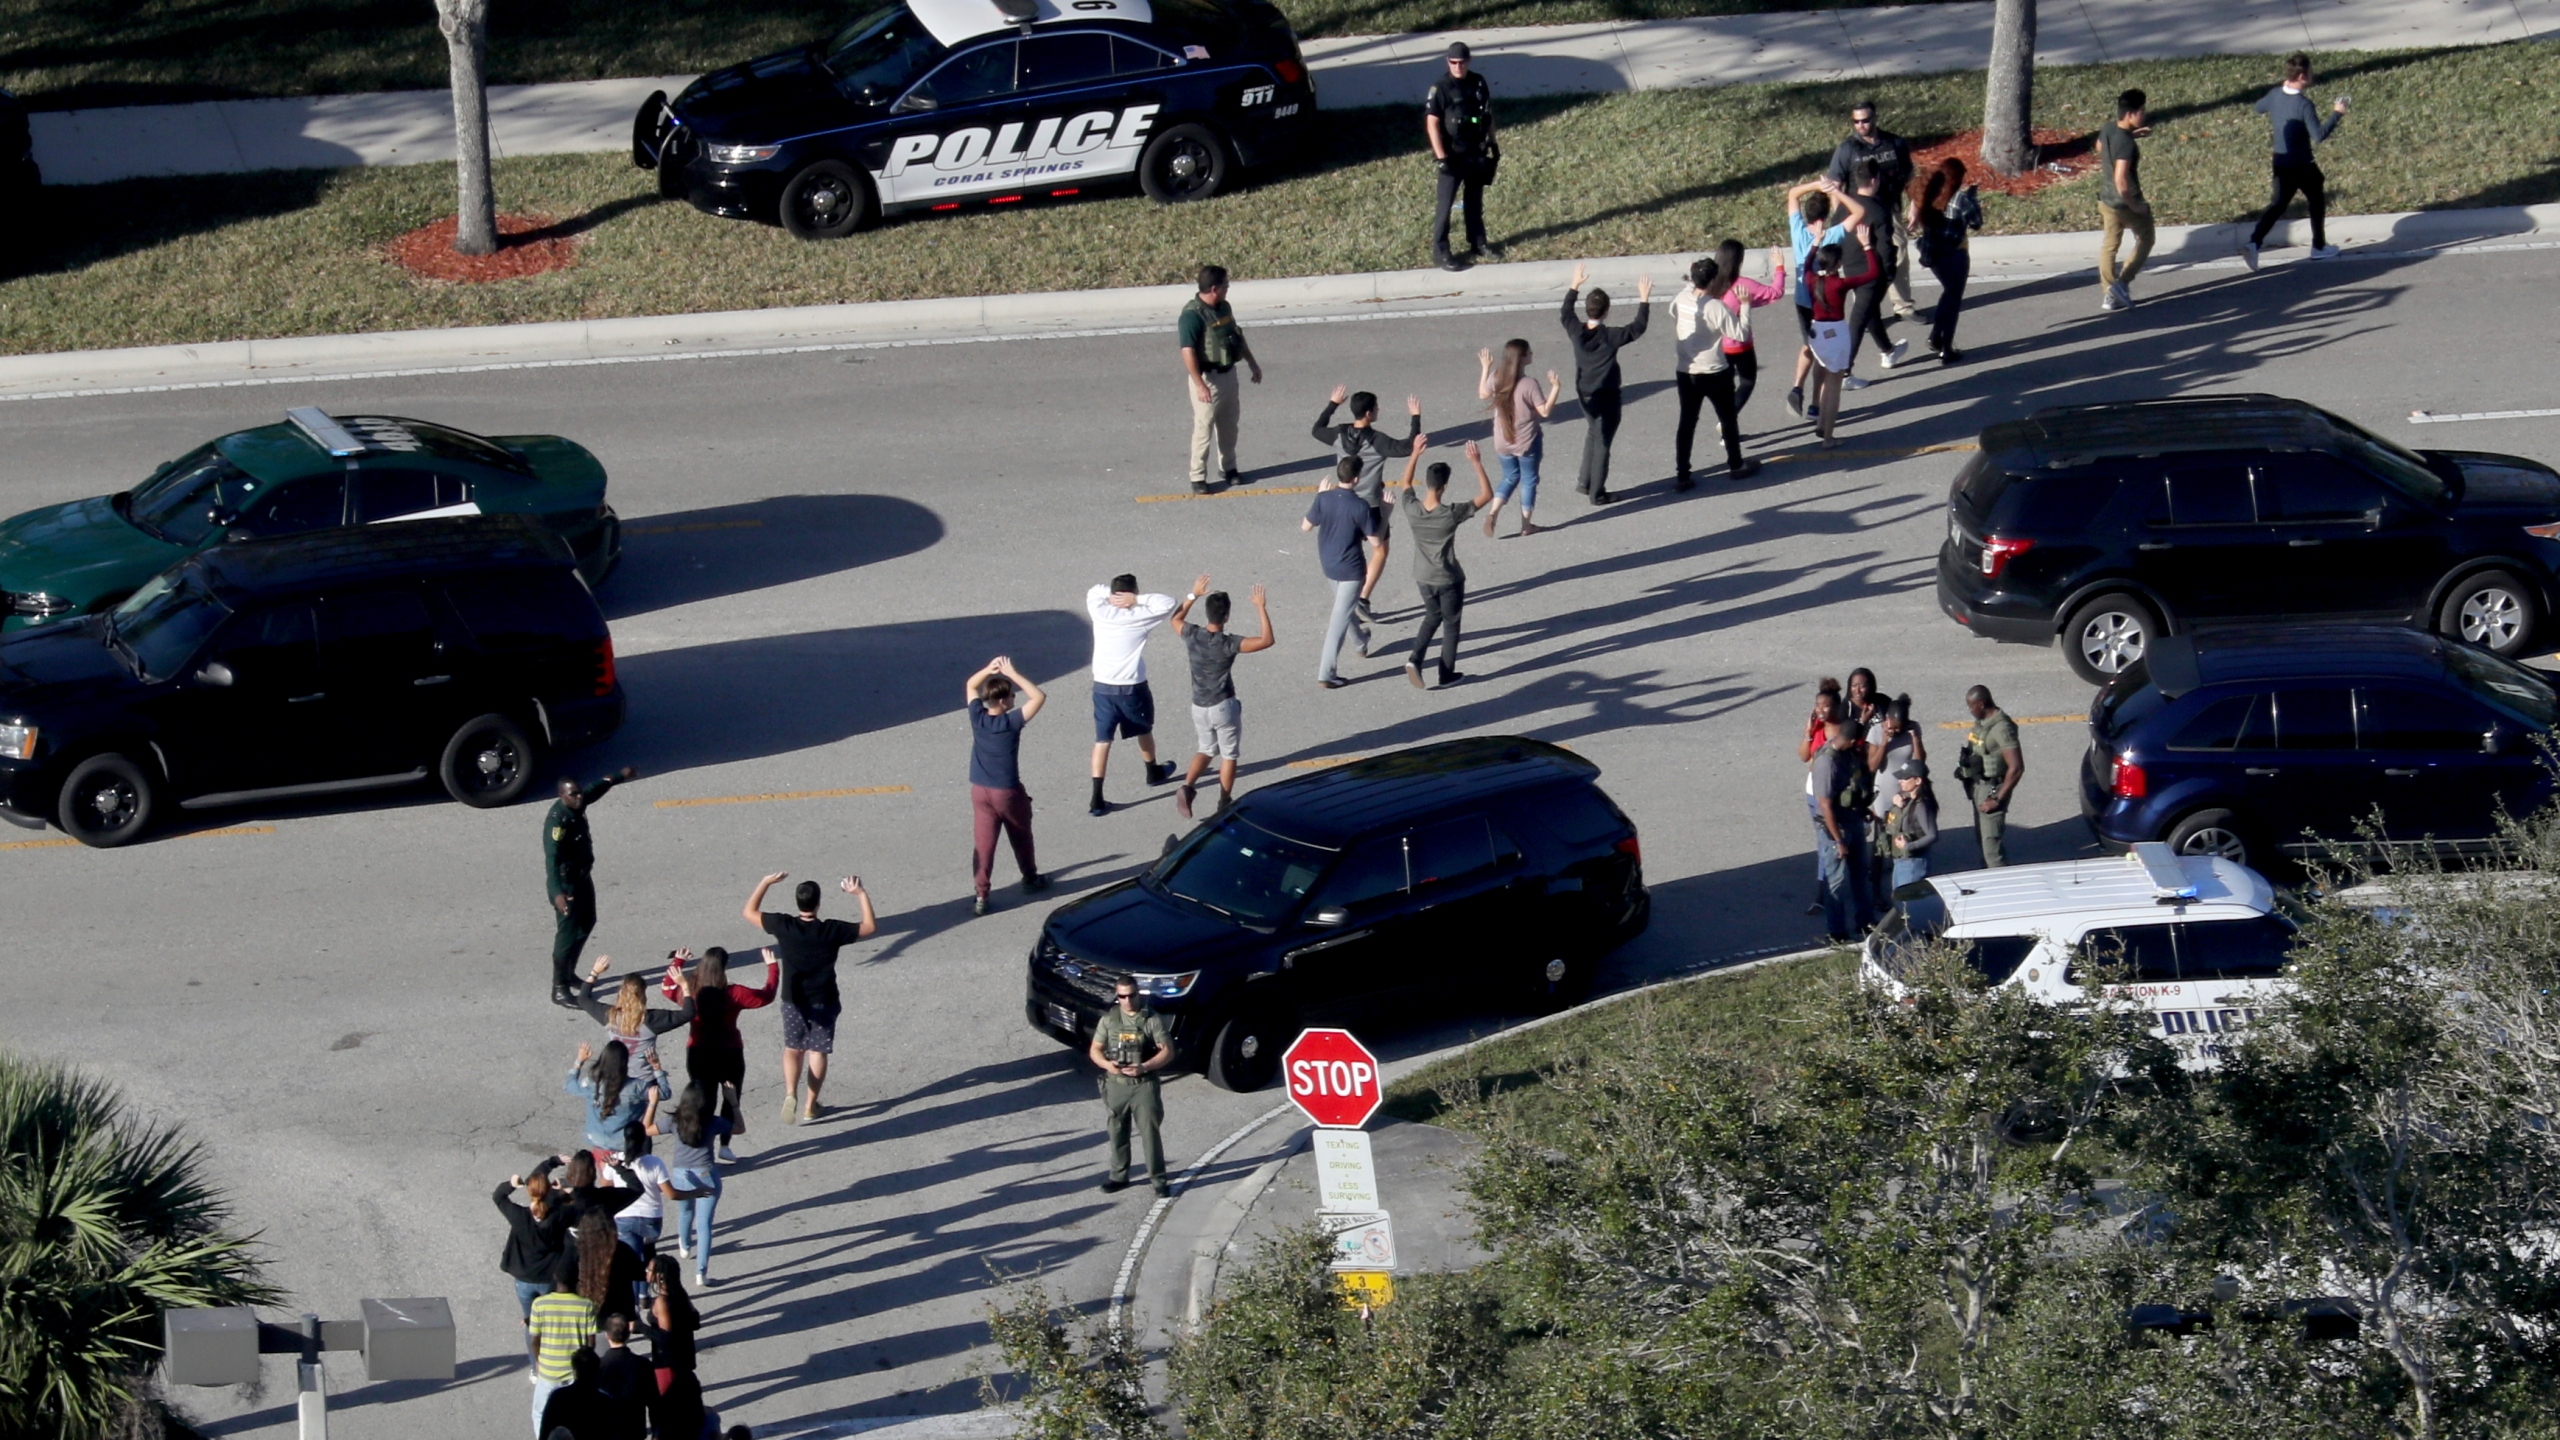 Florida_School_Shooting_911_Calls_05053-159532.jpg52856313